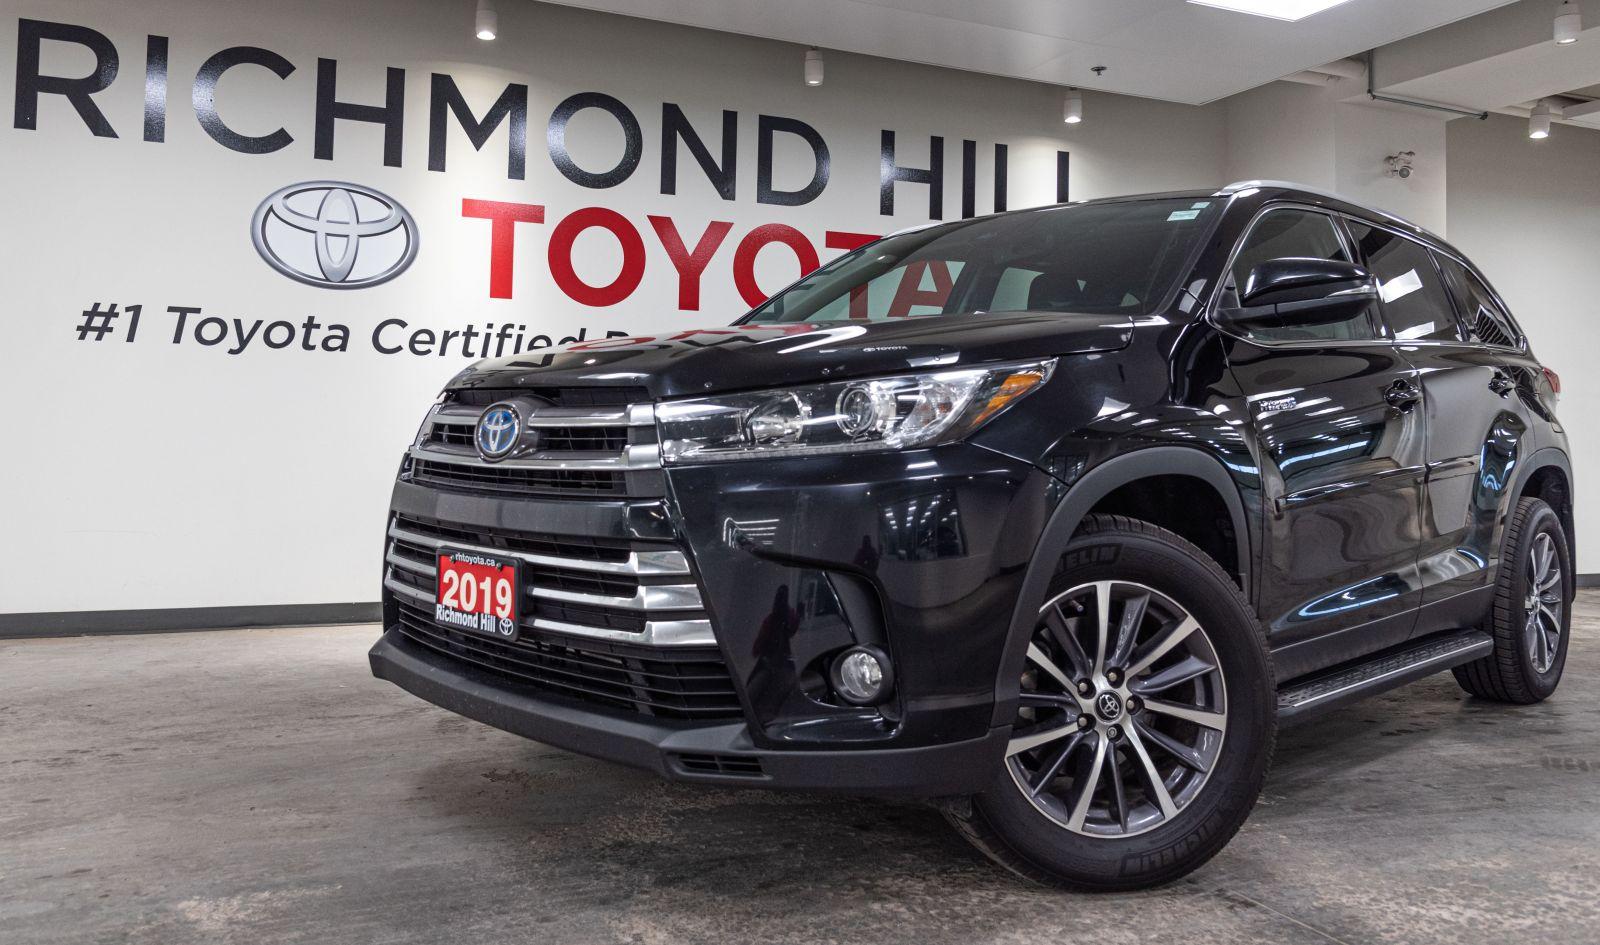 2019 Toyota Highlander Hybrid Image